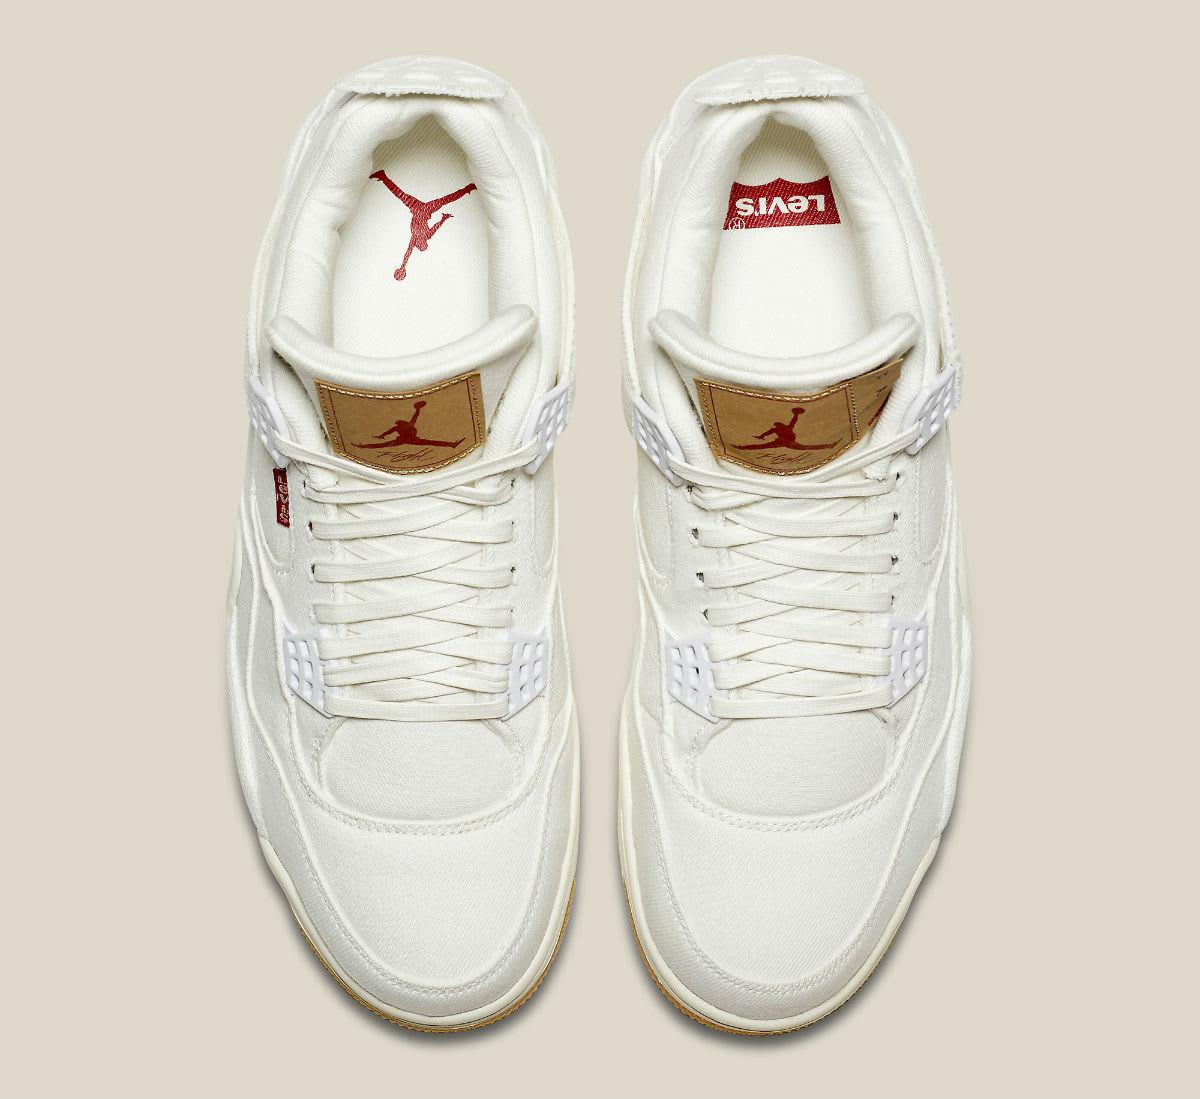 Levi's x Air Jordan 4 White Demin Release Date AO2571-100 Top